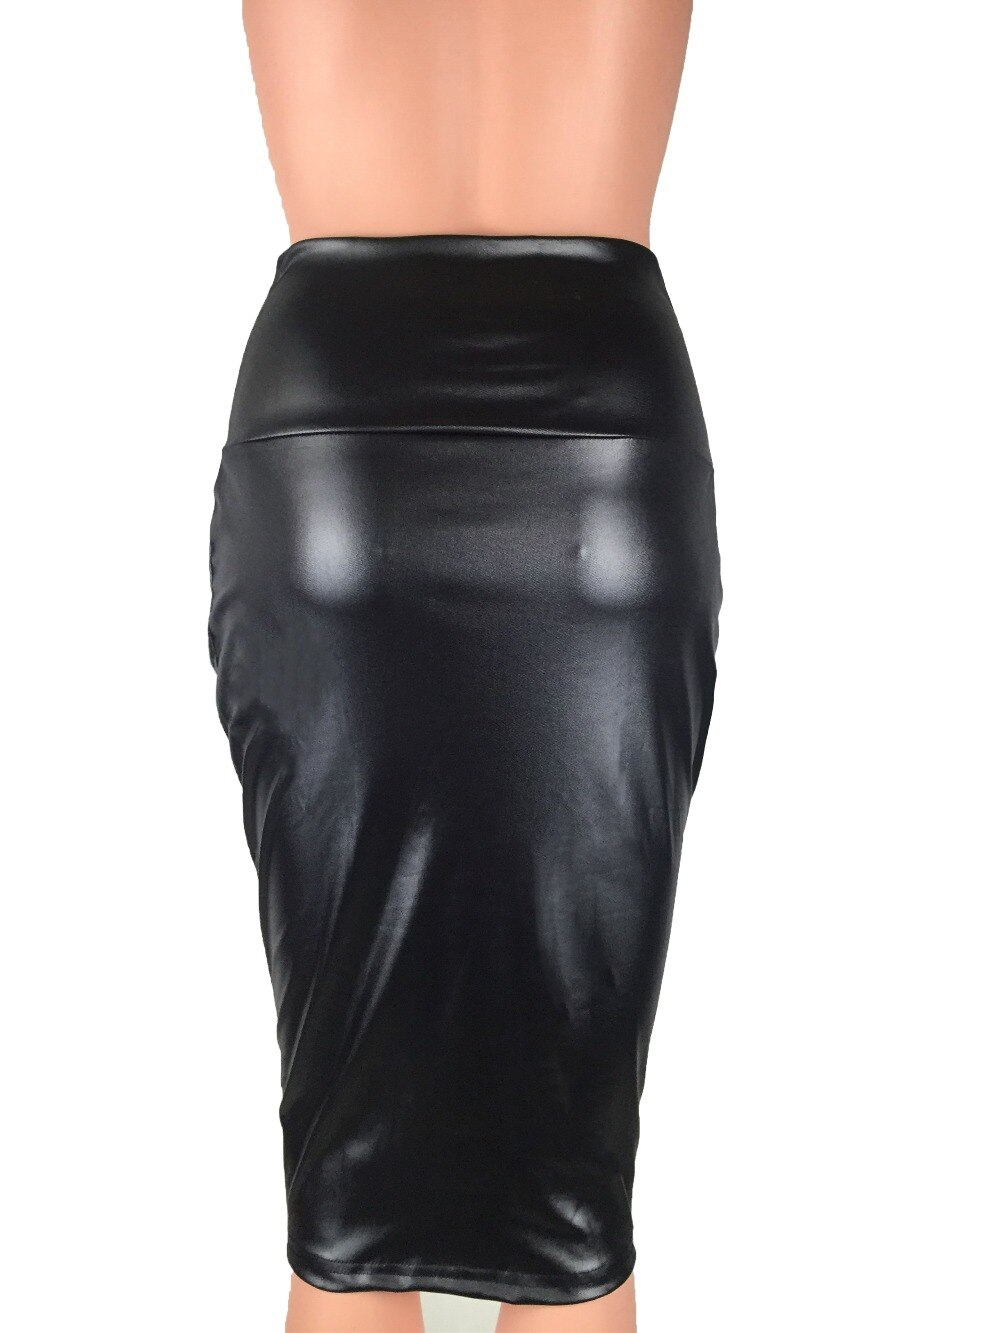 Bohotcotol High waist faux Leather Skirt XXXL Black sexy Pencil skirts middle long Casual mermaid skirt party bar club travel 3